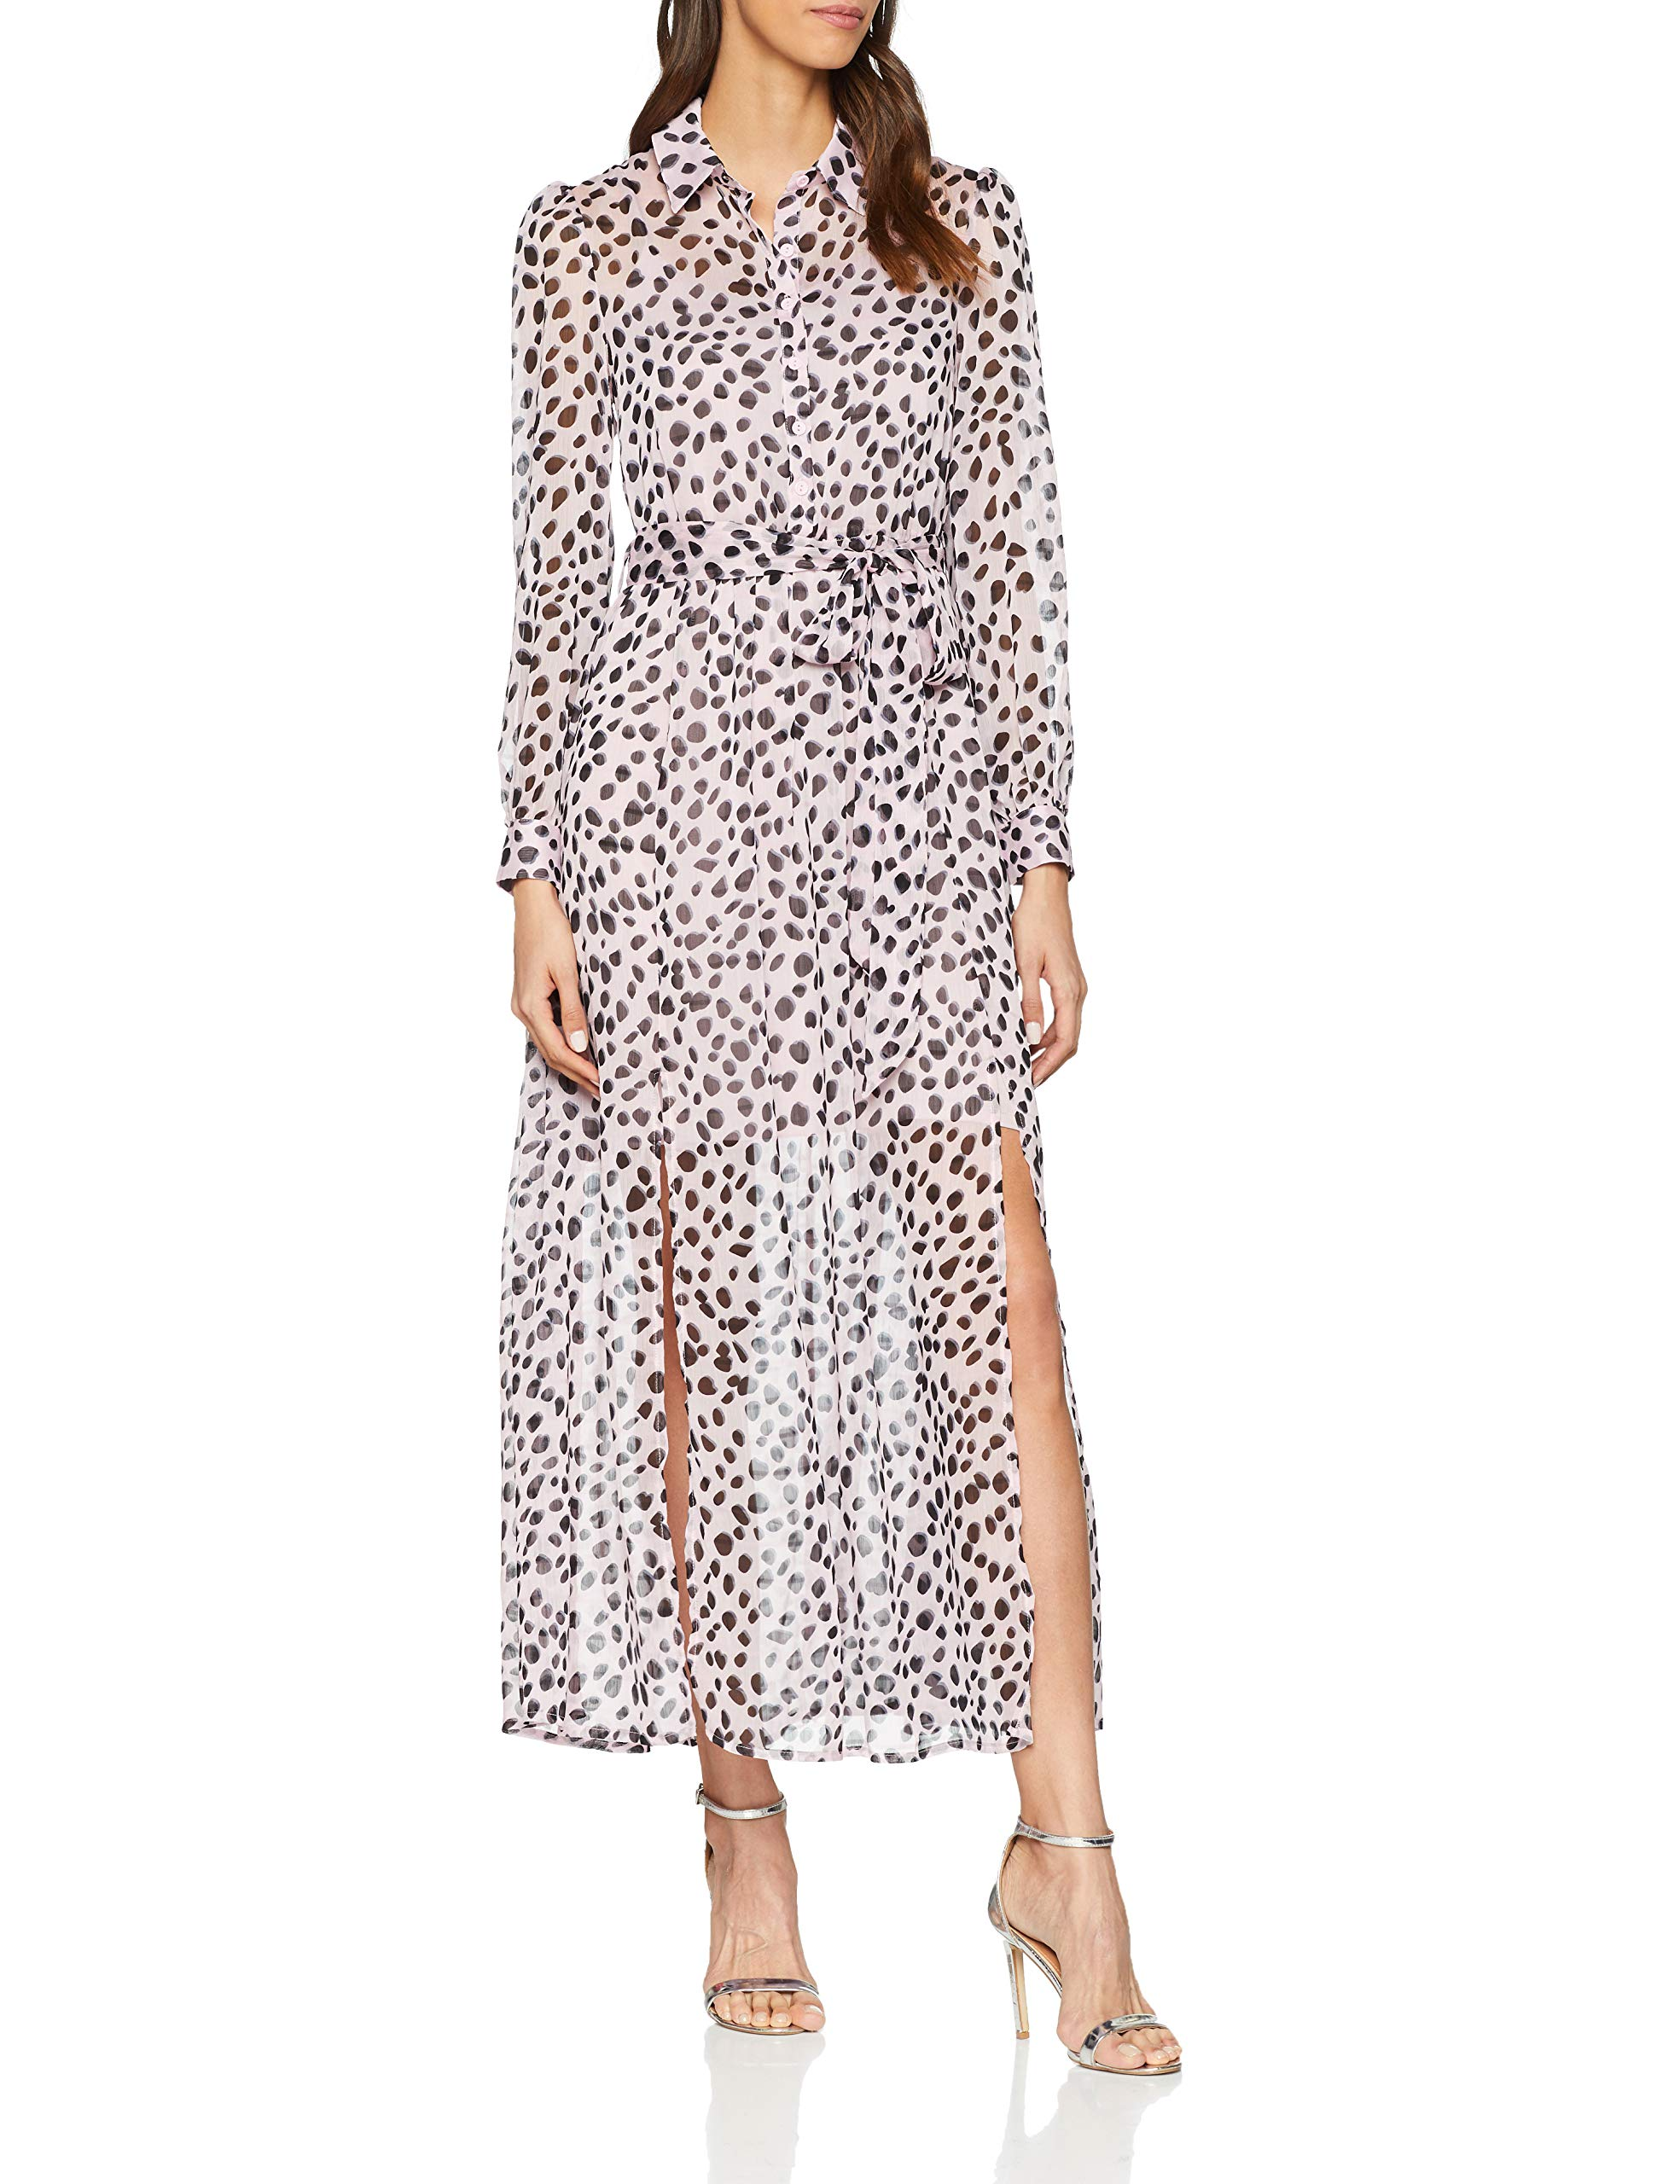 Fabricant12Femme Dress Bz4440taille RobeMulticolorelilac Print Animal Maxi Ladies Dalmatian Glamorous PnO8wk0